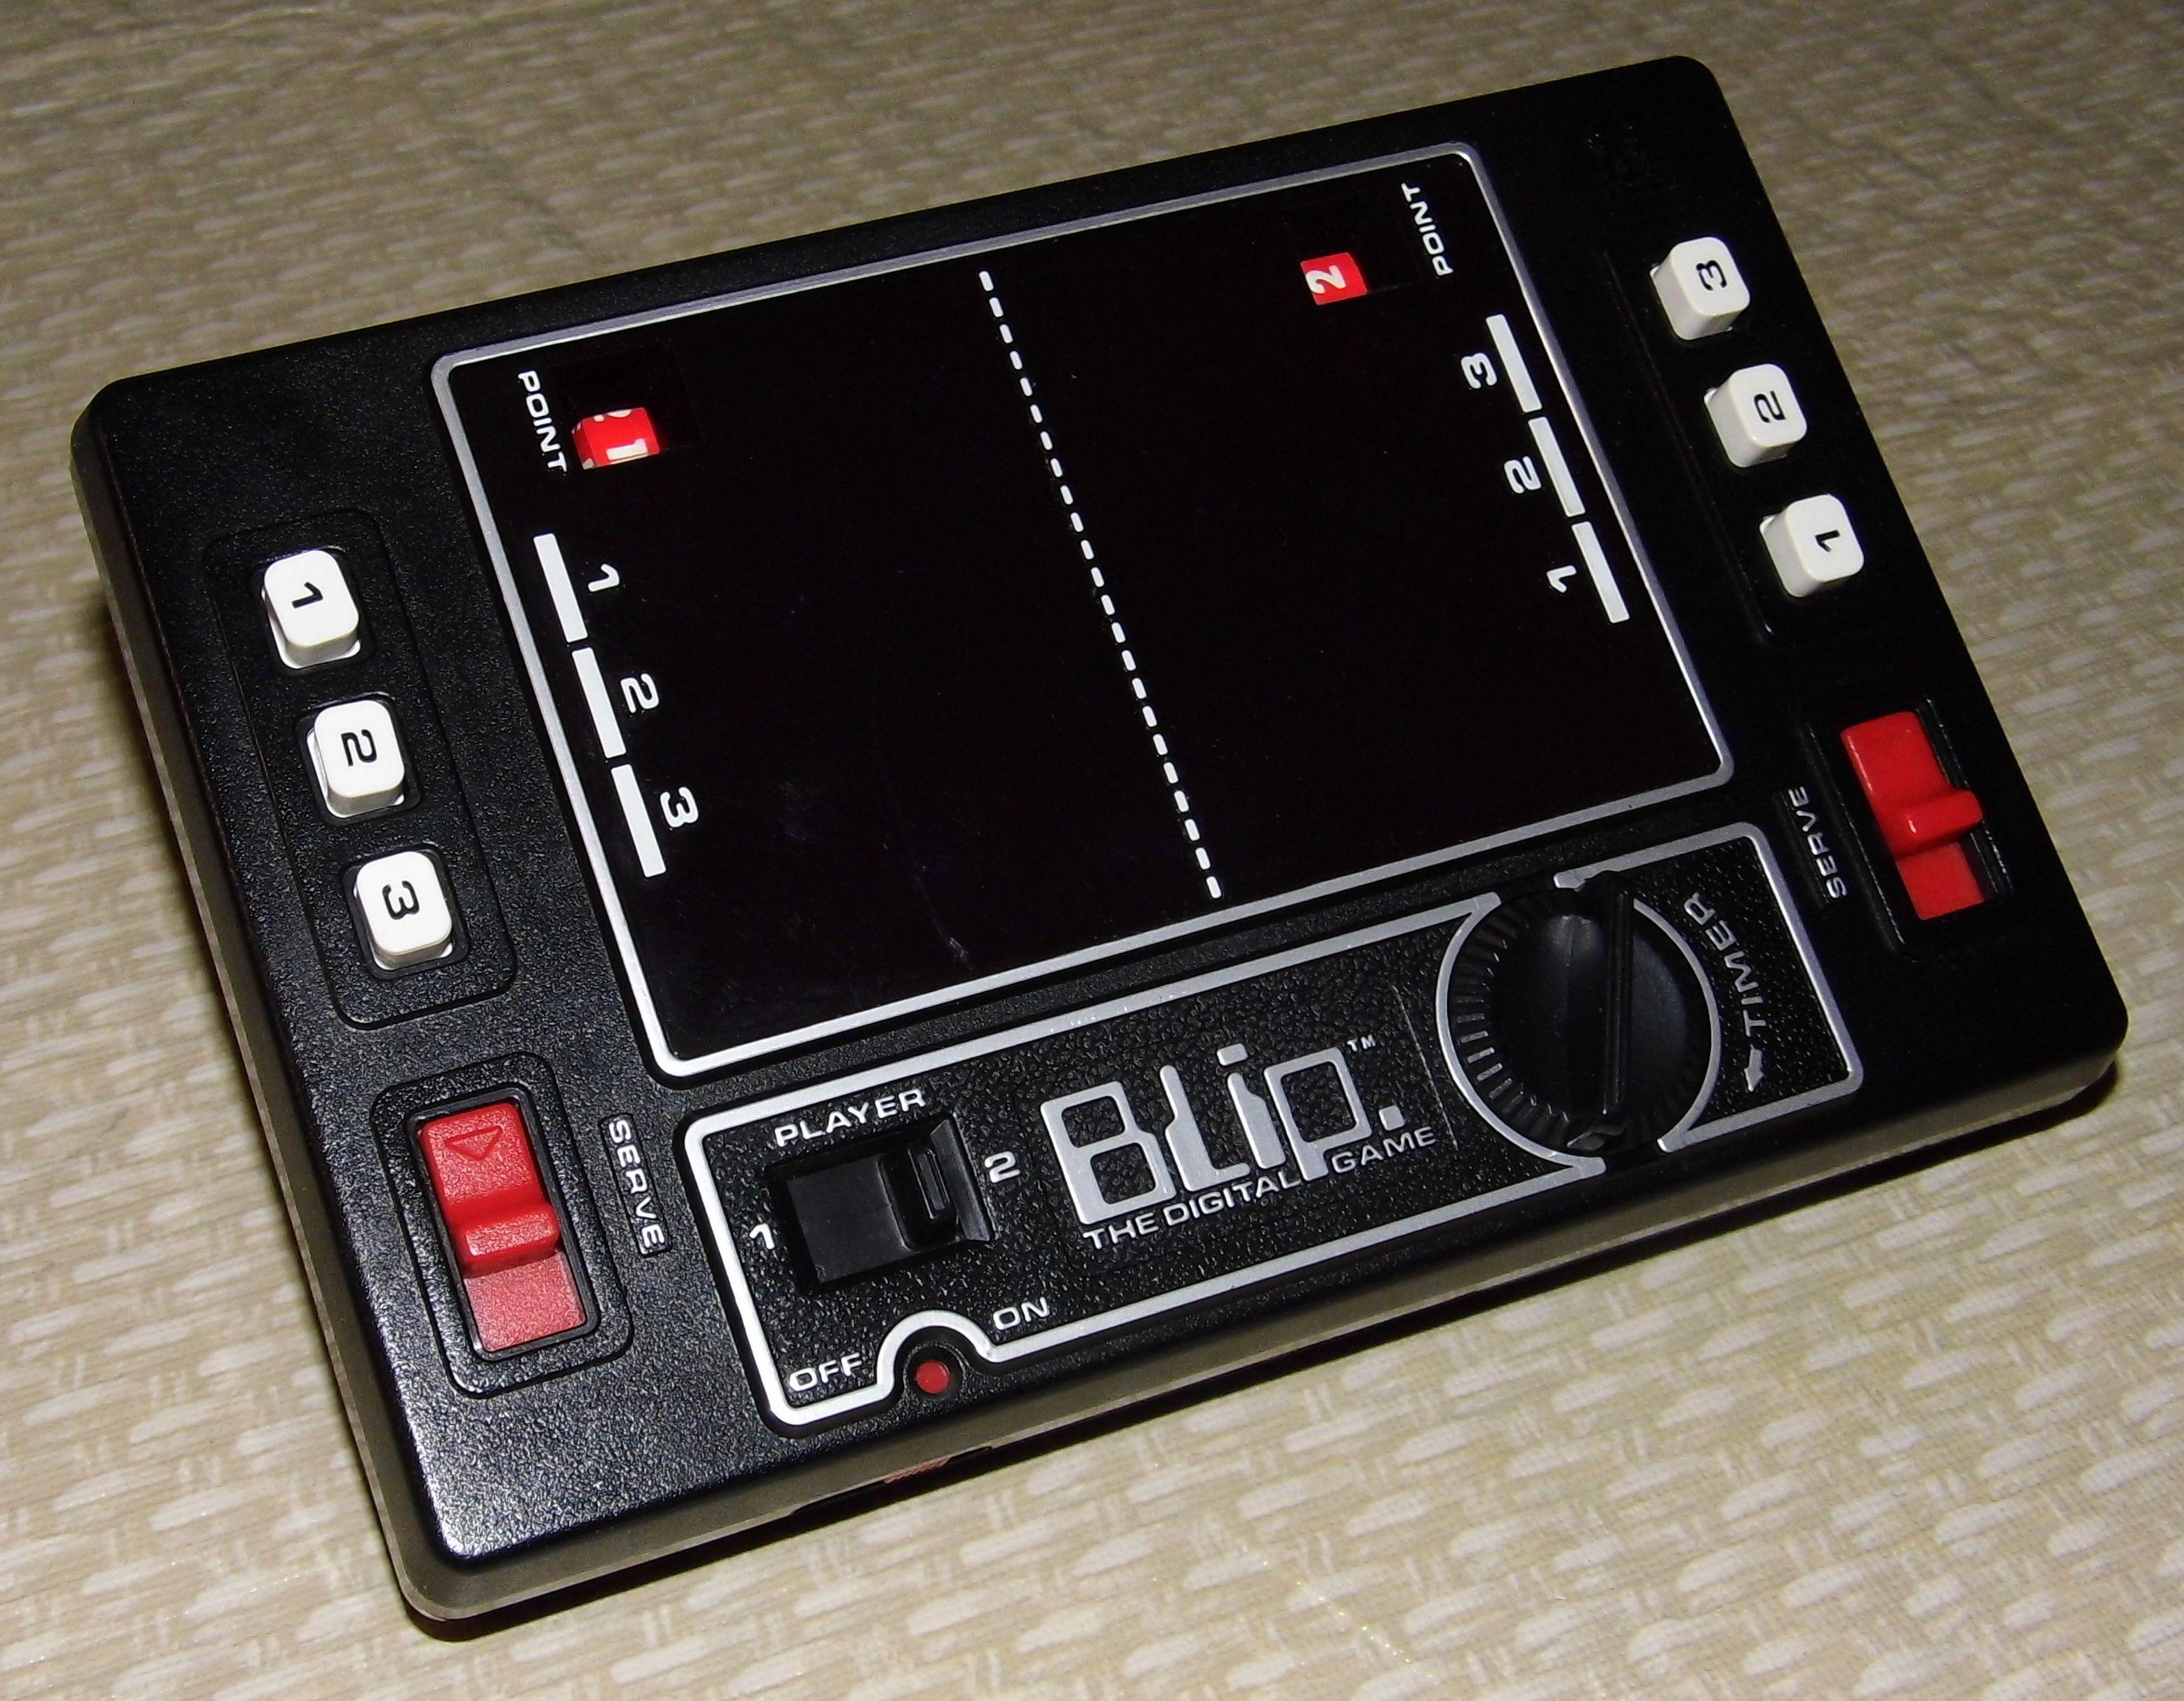 Vintage Blip The Digital Game 1977 Tomy Electronic Game Works